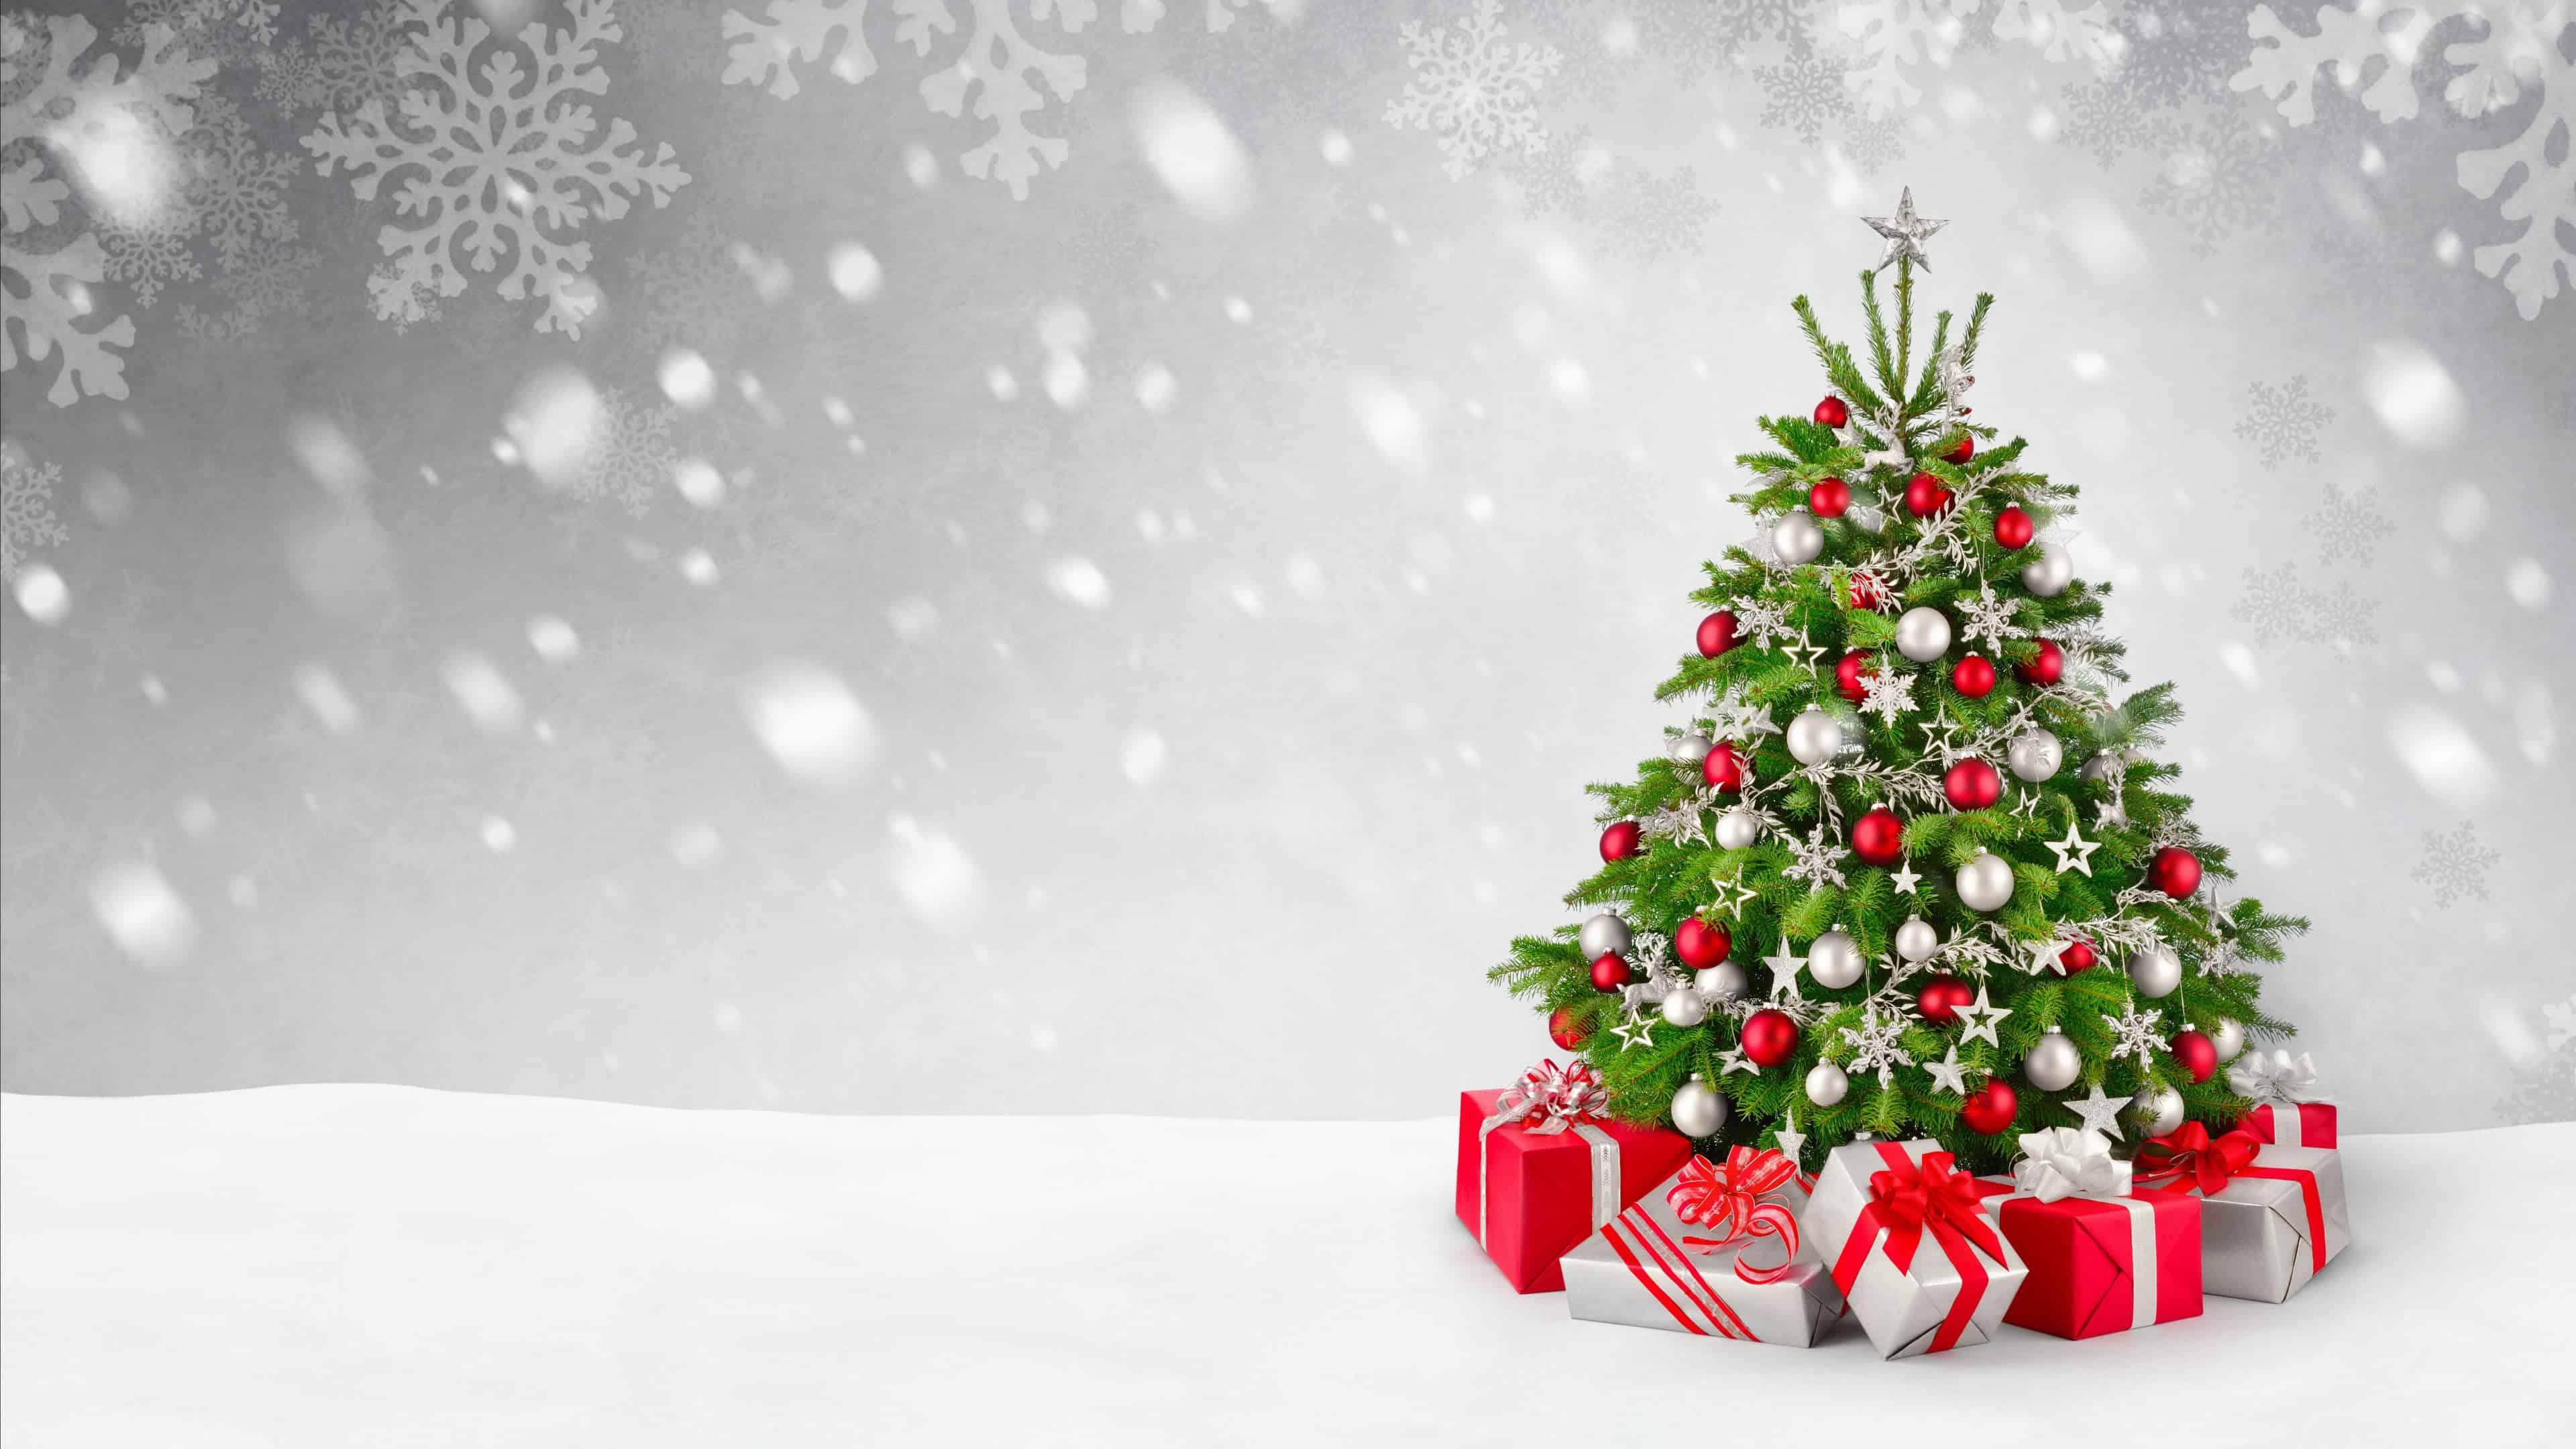 christmas tree and gifts uhd 4k wallpaper